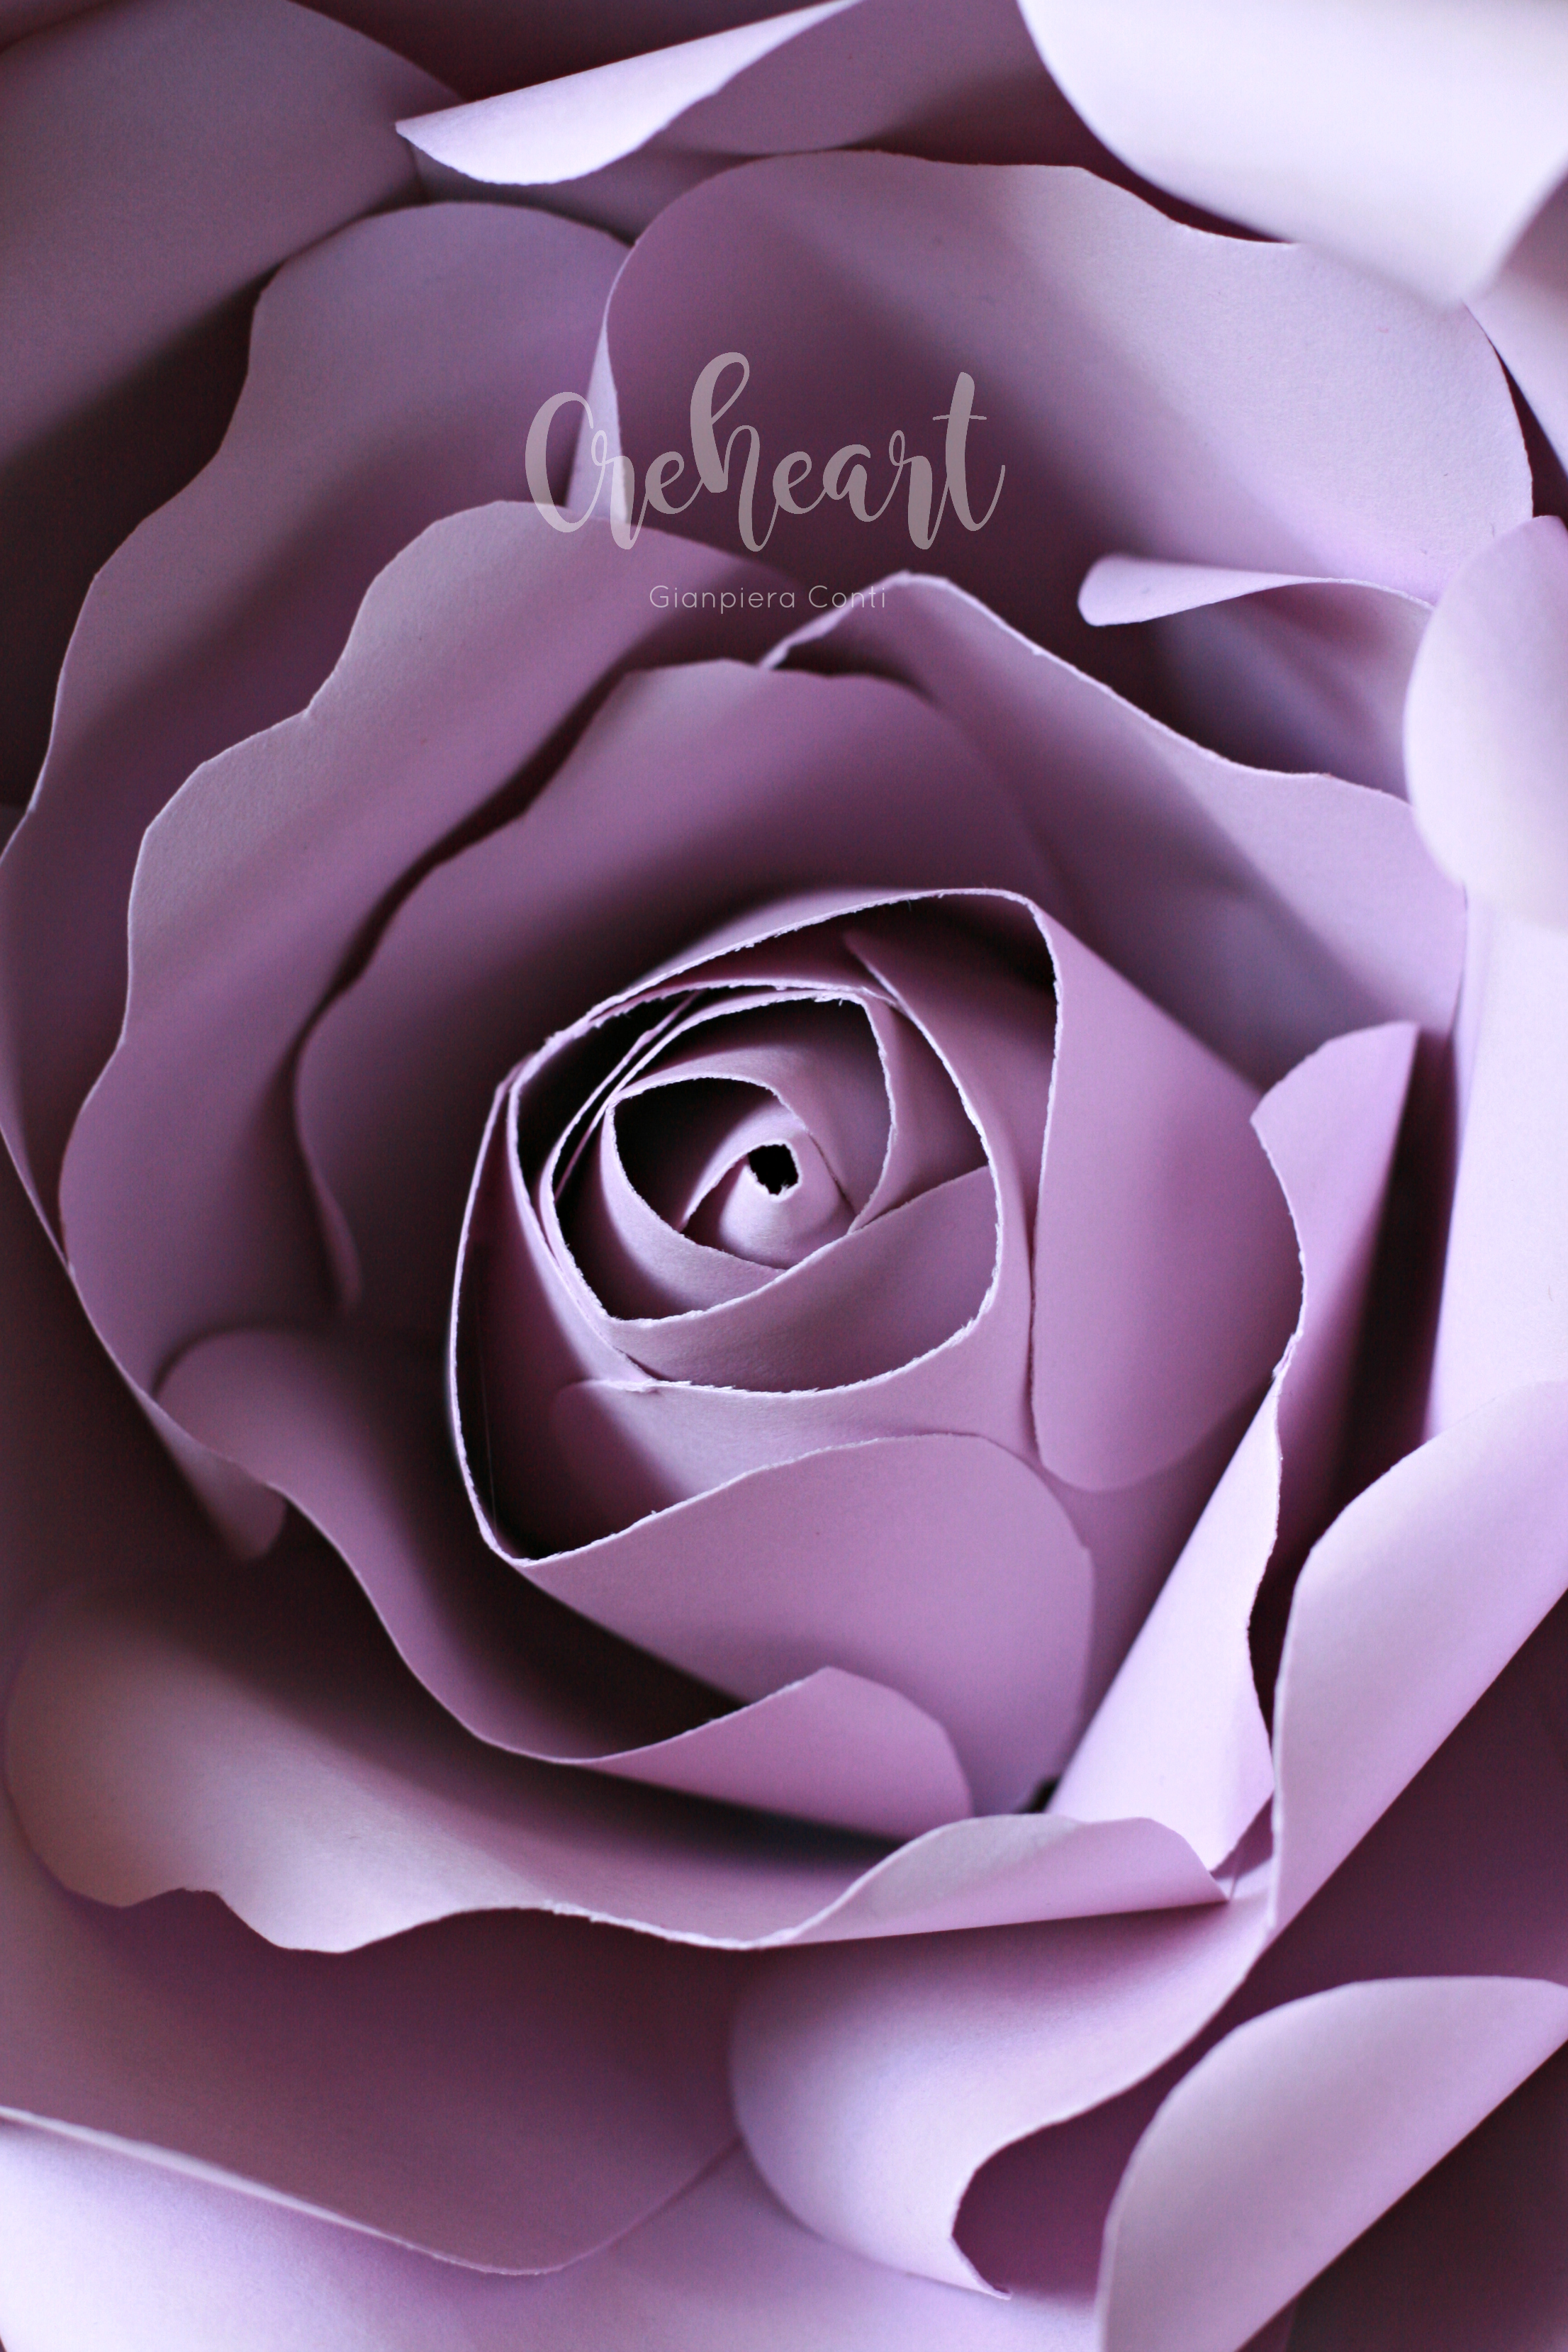 Lilac Giant Rose Creheart.jpg